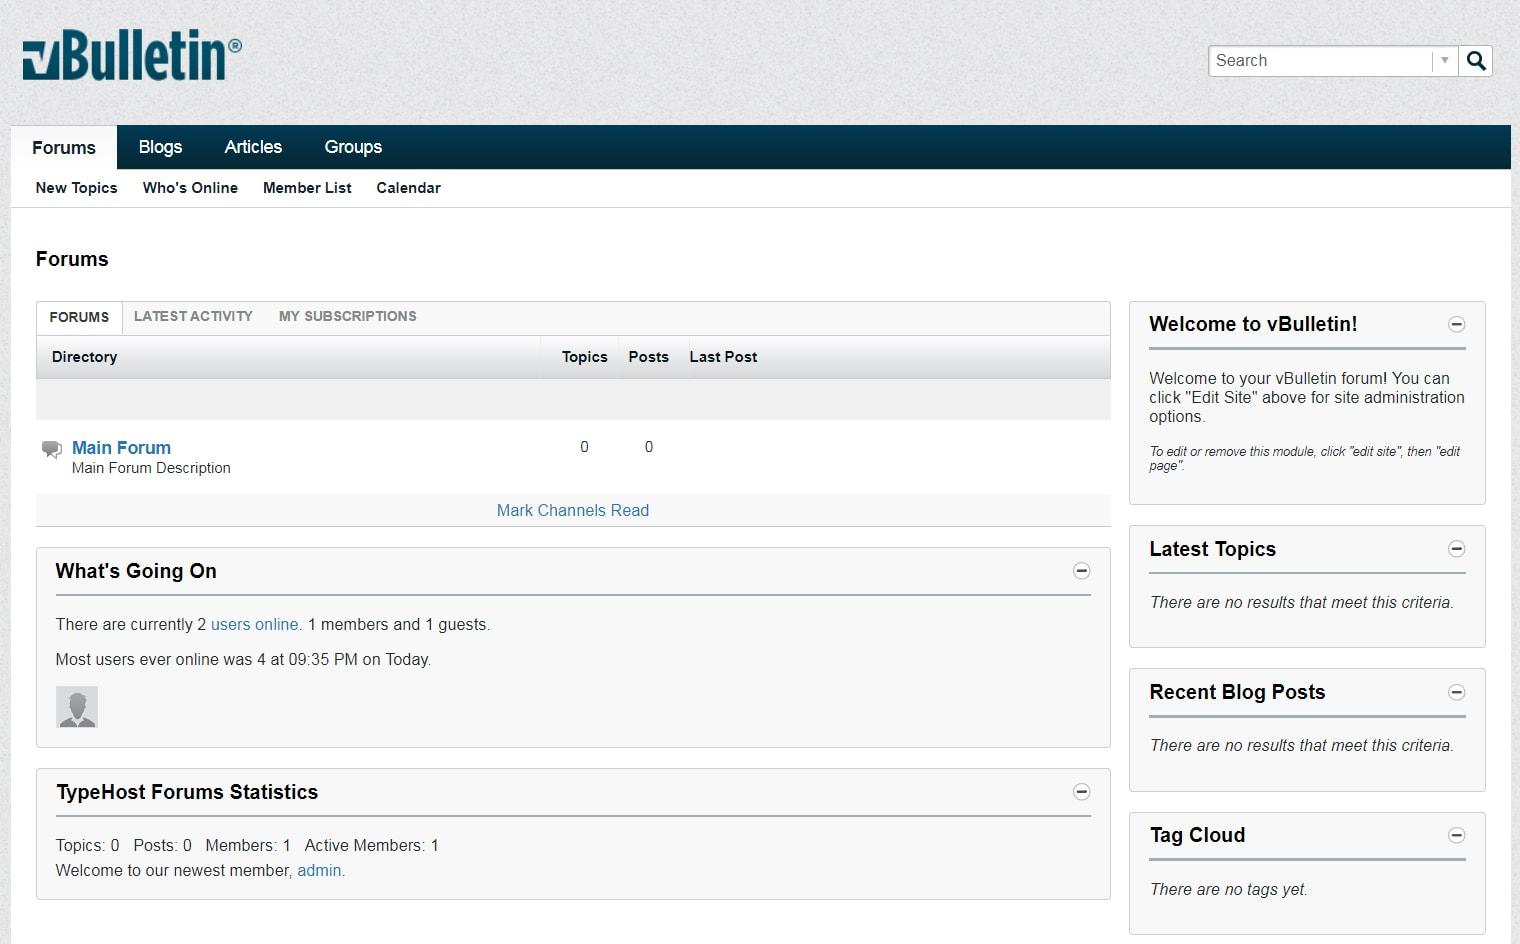 VBulletin - Content Management System